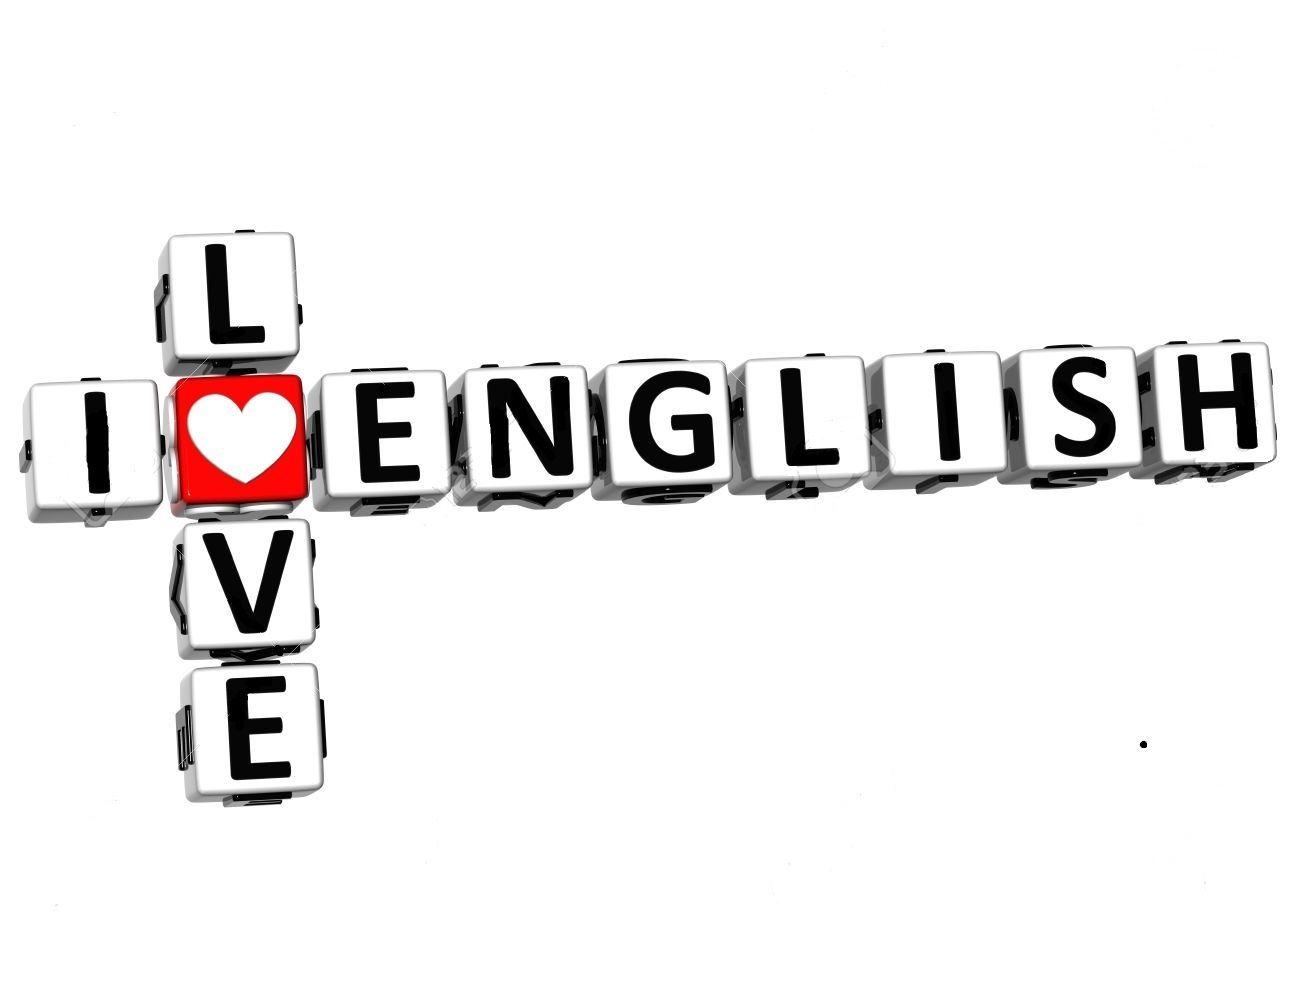 LEZIONI DI CONVERSAZIONE D'INGLESE - CONVERSATIONAL ENGLISH LESSONS ONLINE!!